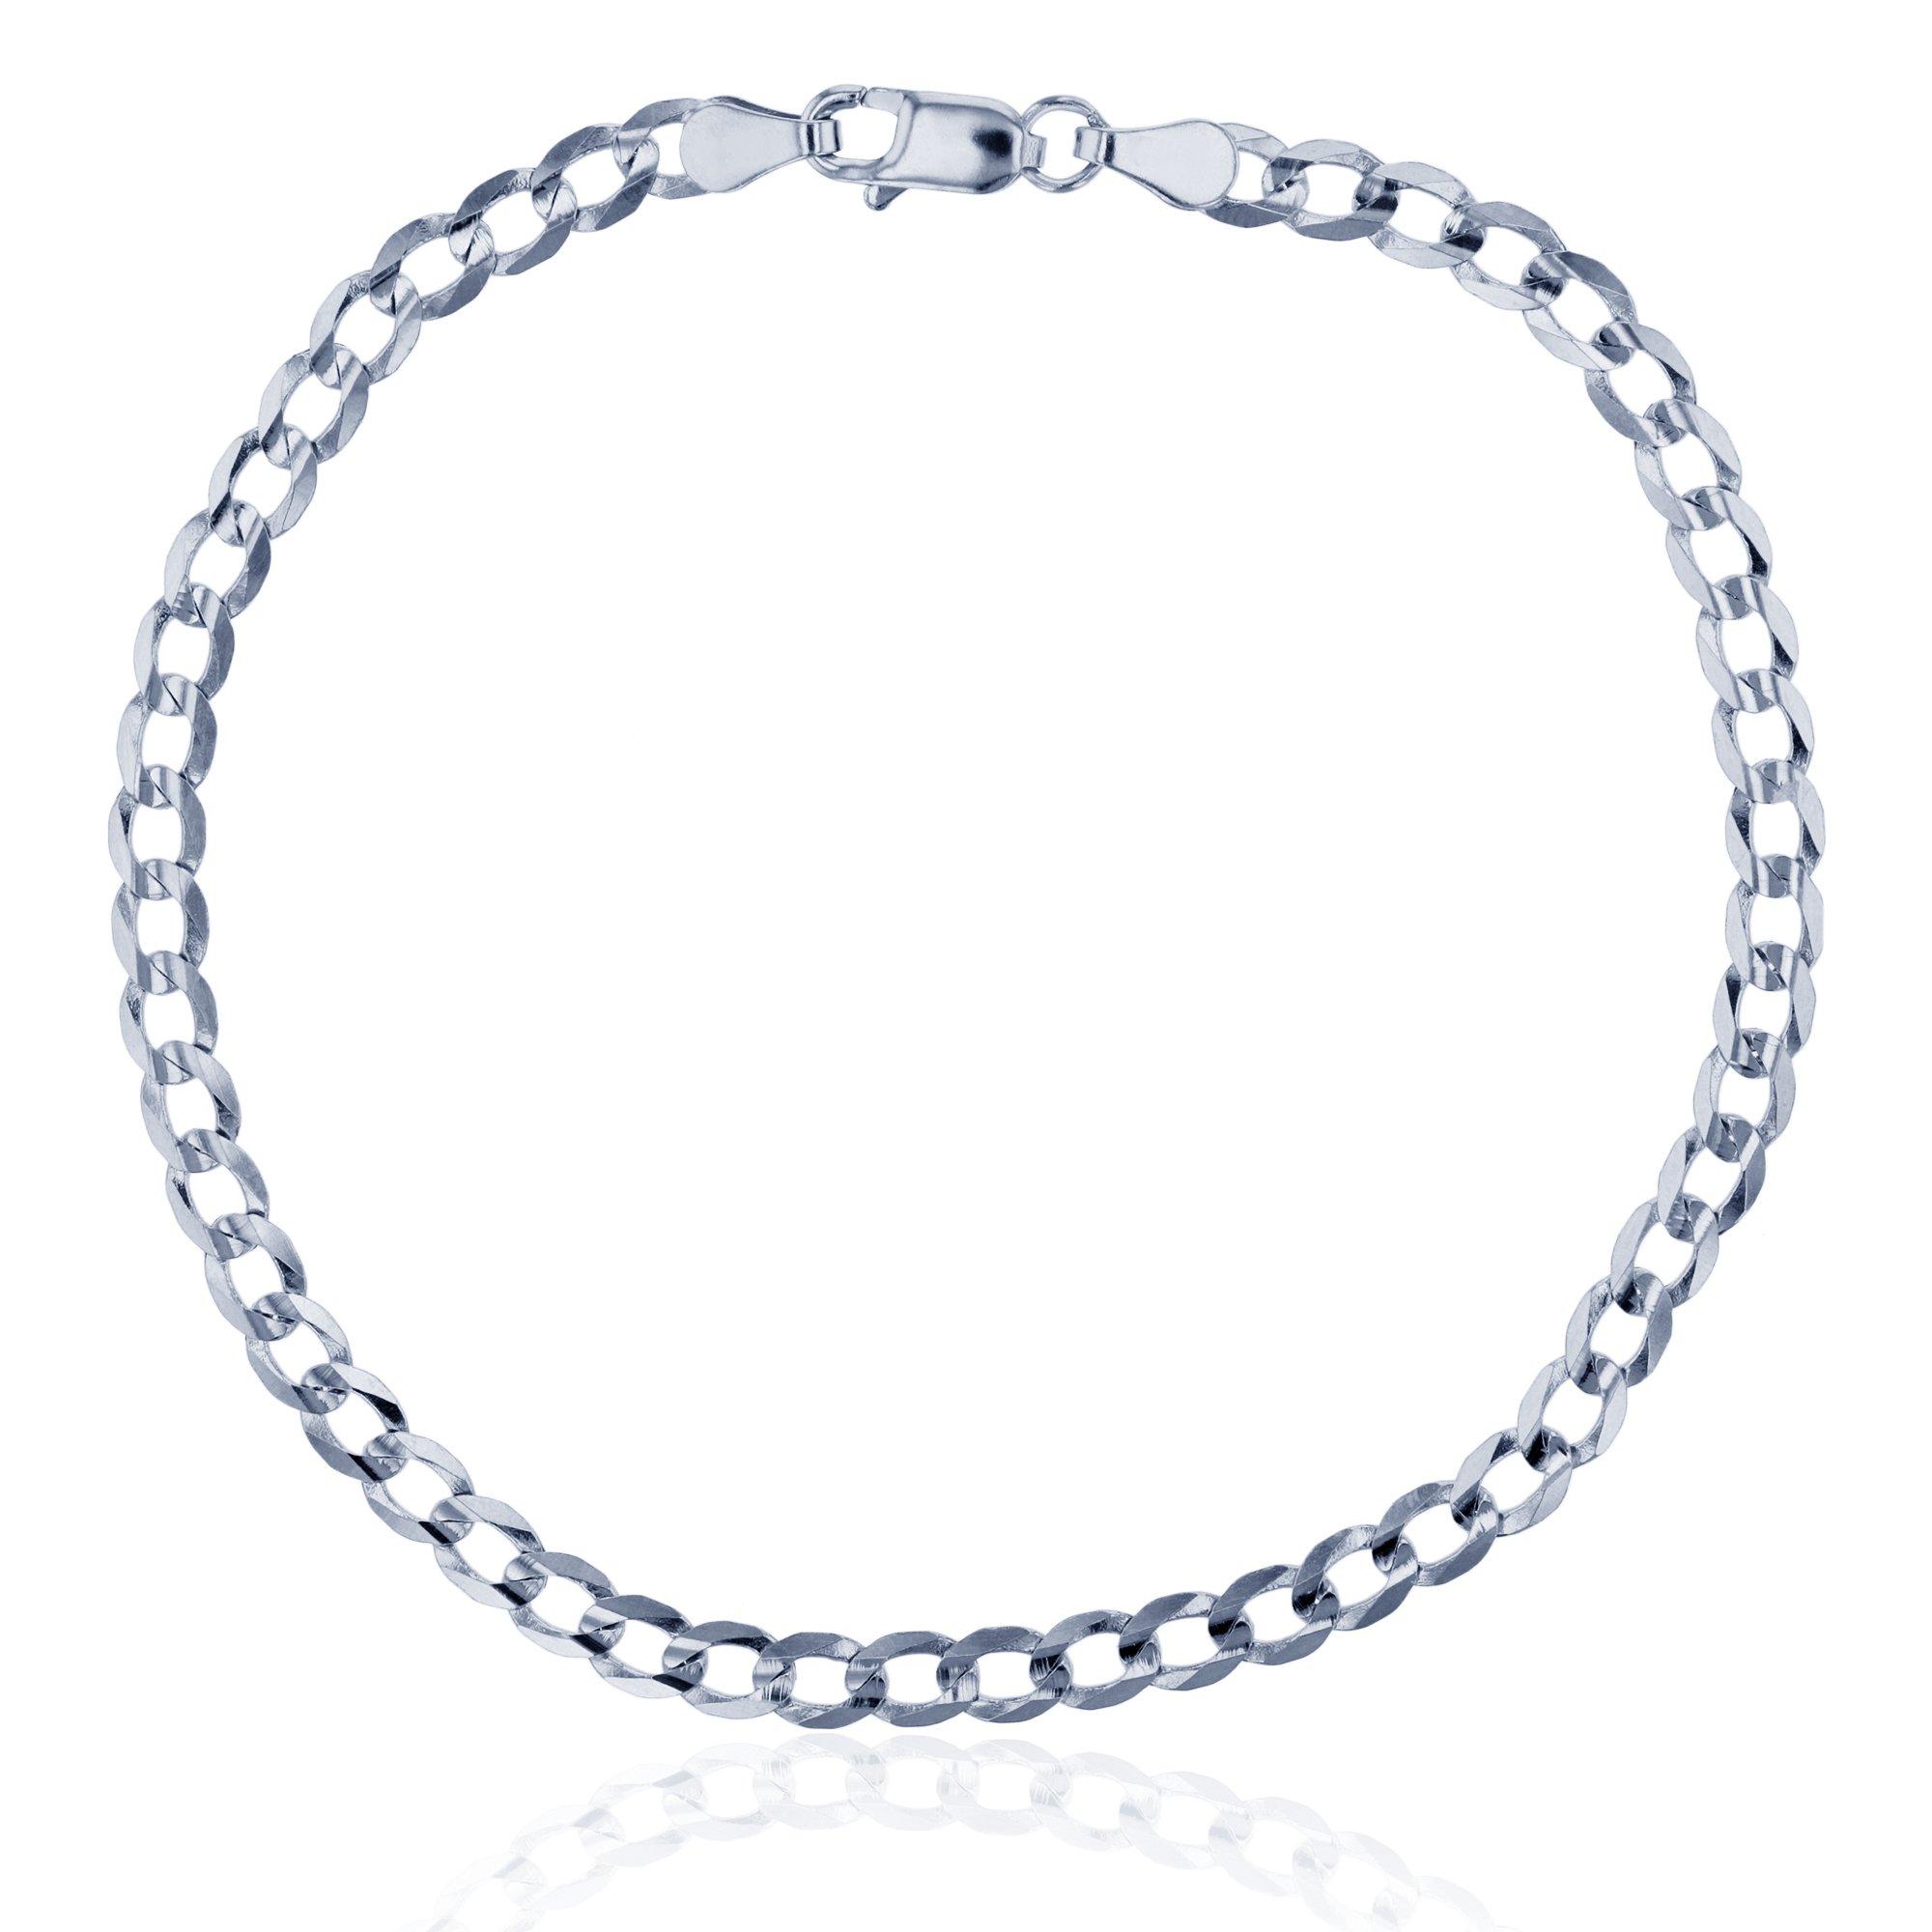 14K White Gold 3.90mm 8'' Concave Curb Flat Lite 100 Chain Bracelet